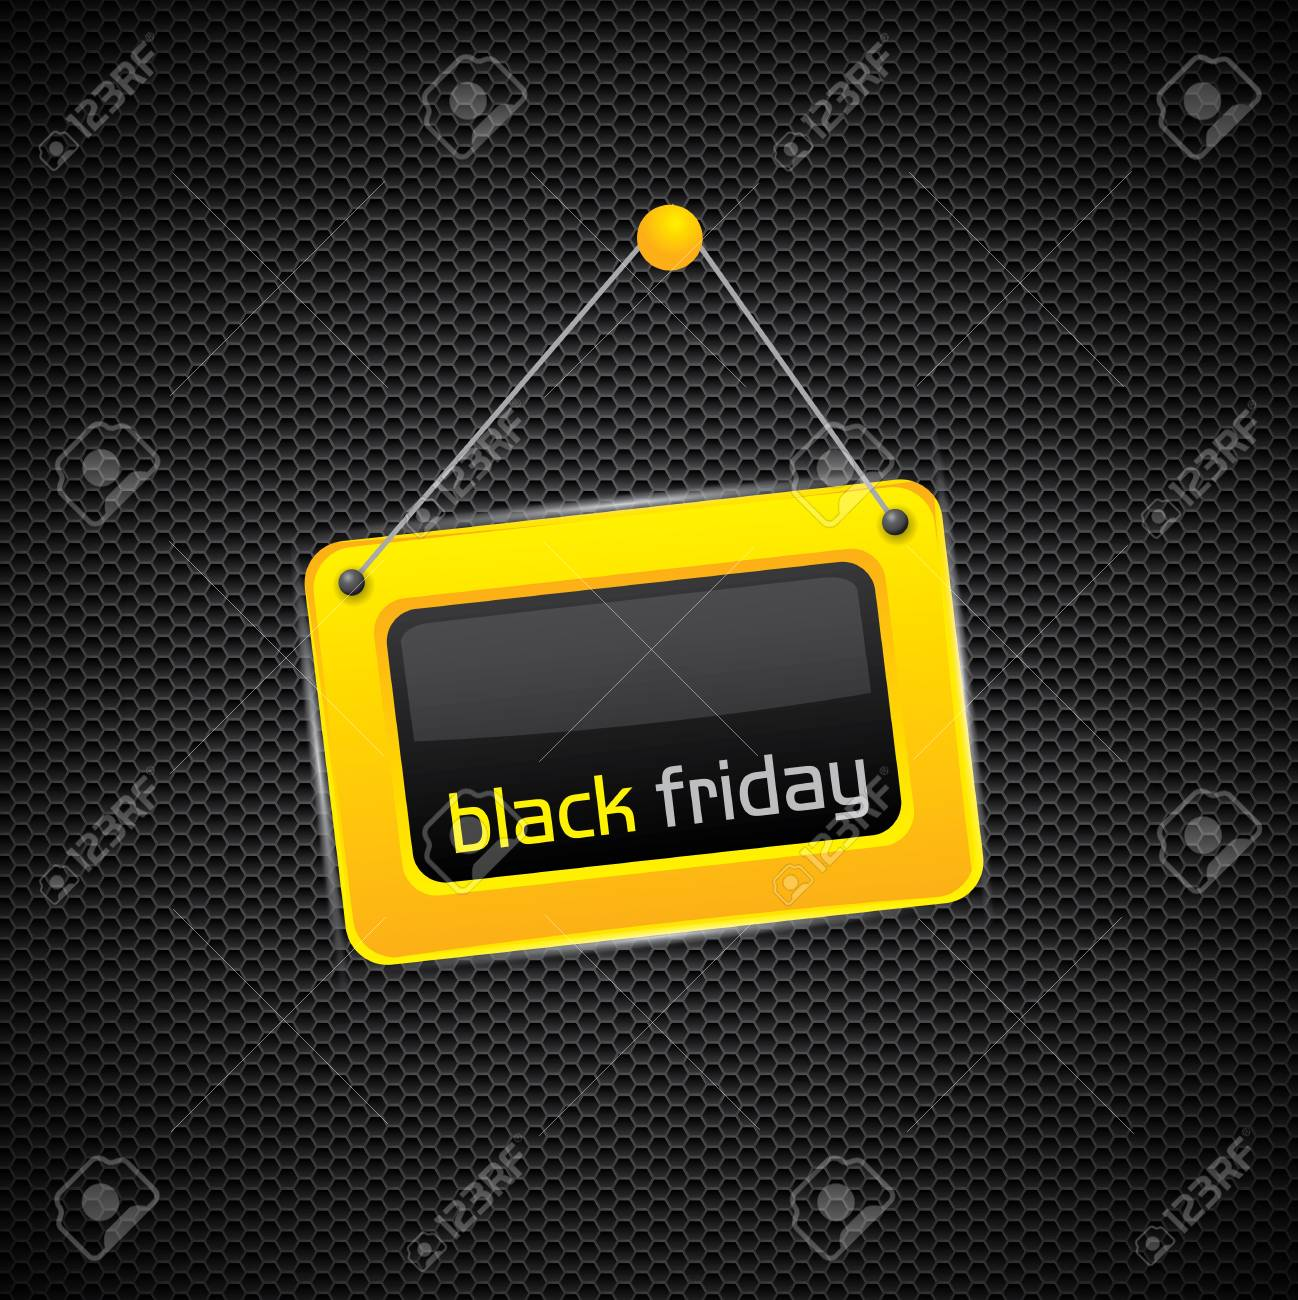 Black Friday glossy yellow sign Stock Vector - 16136269